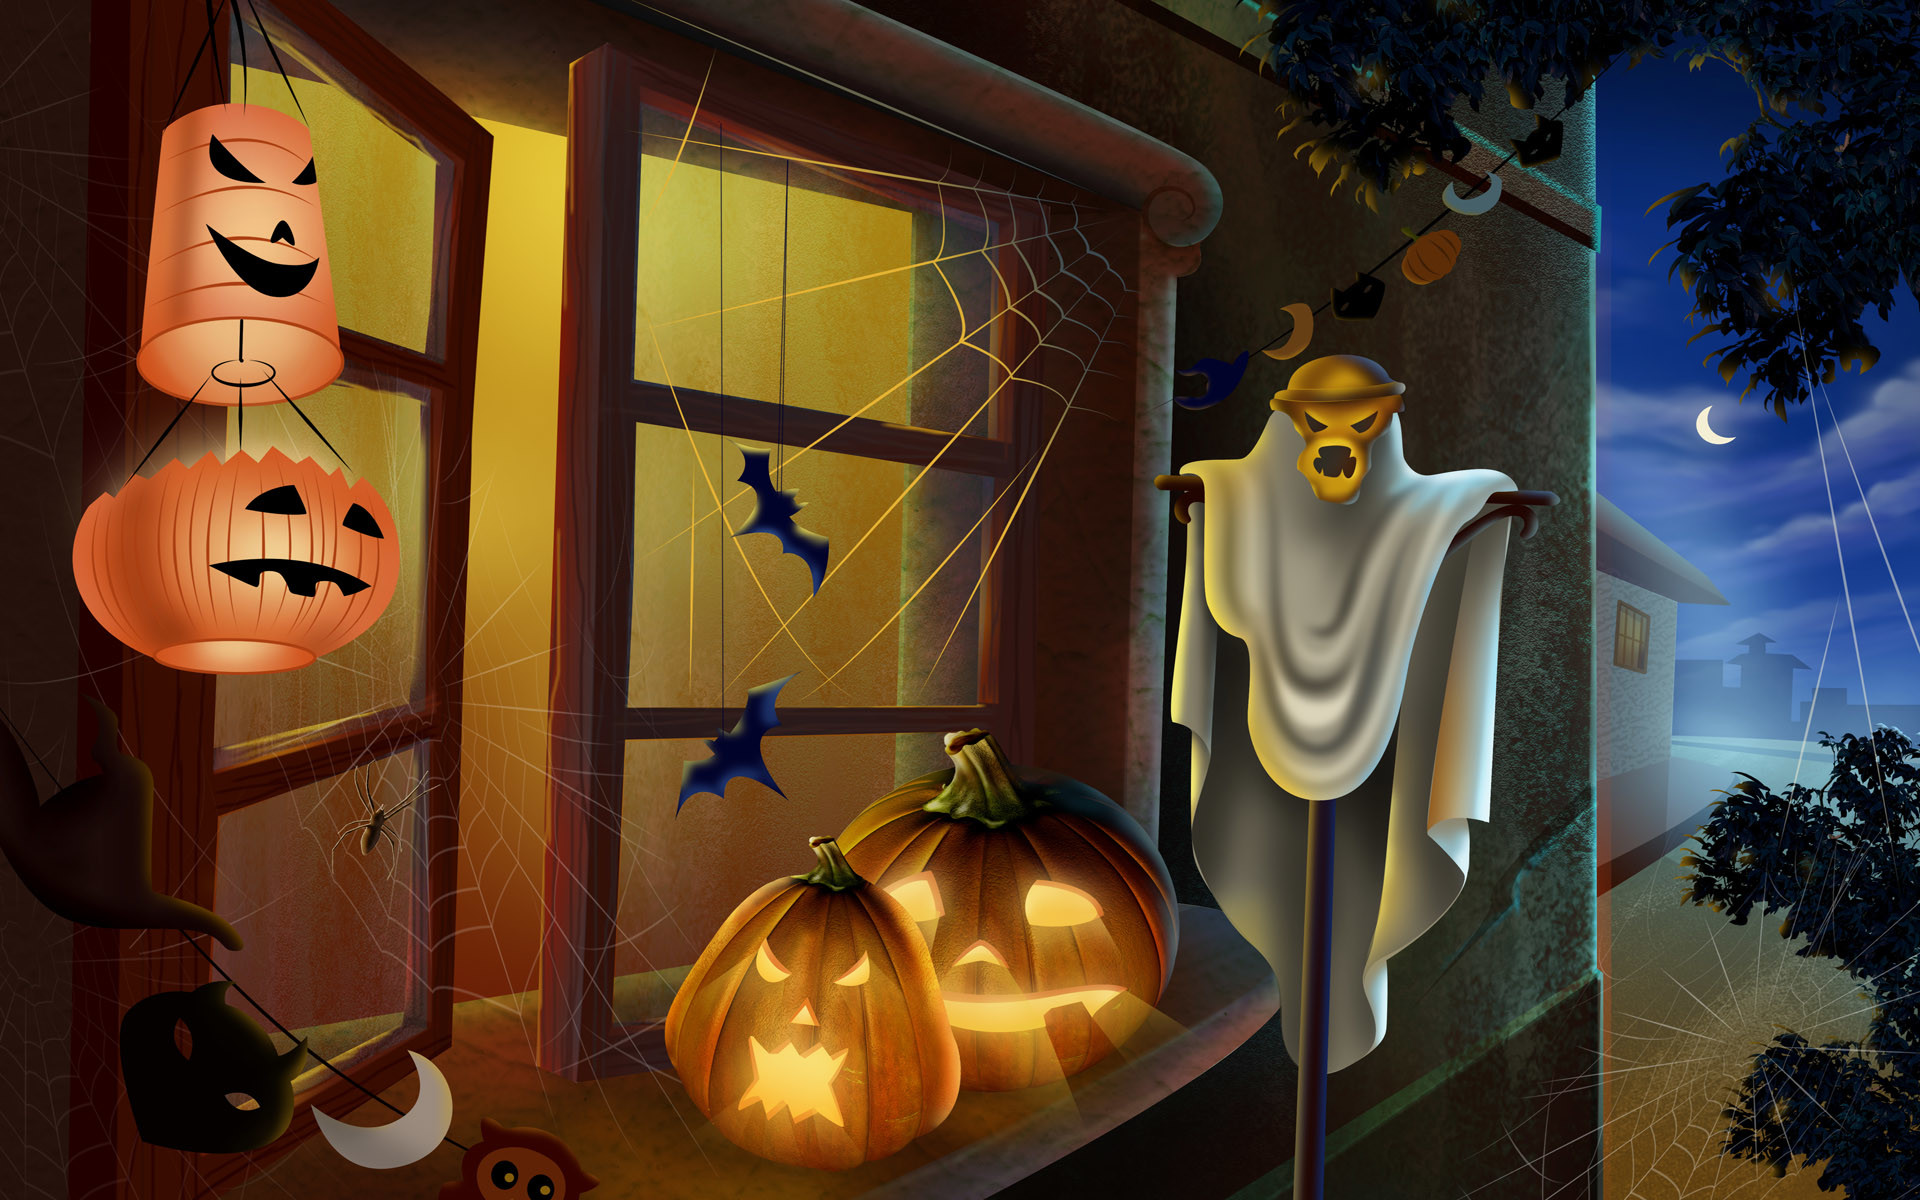 Halloween Desktop Themes | Spooky Halloween Desktop Themes